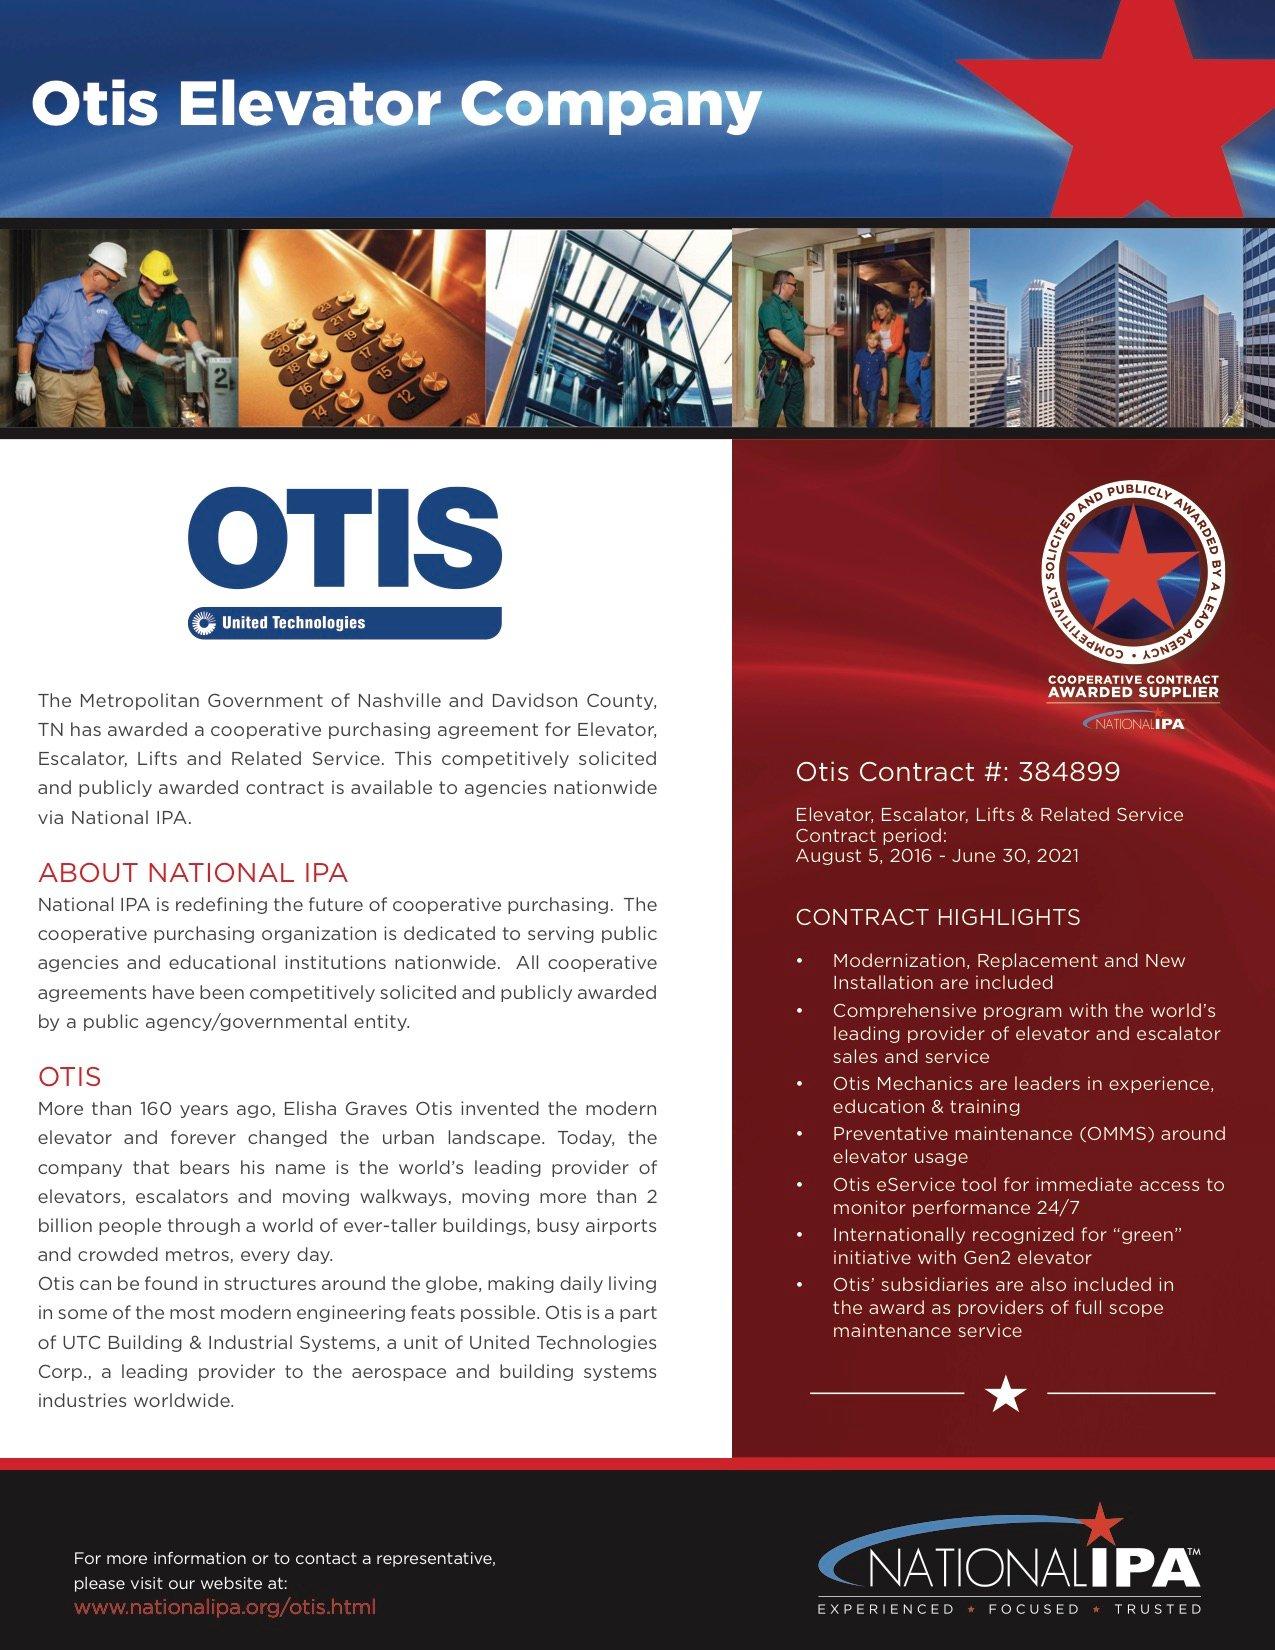 National IPA Flyer Template 2- OTIS